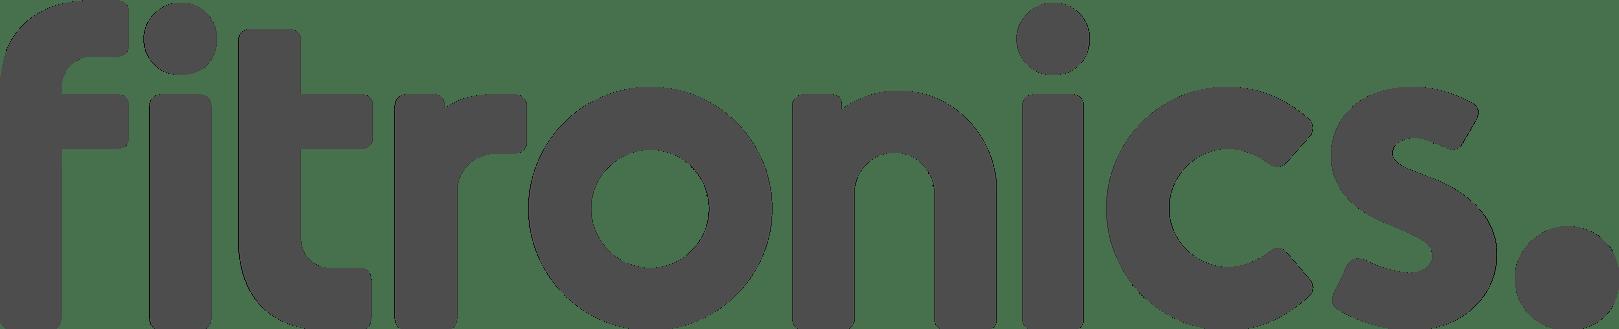 Fitronics logo